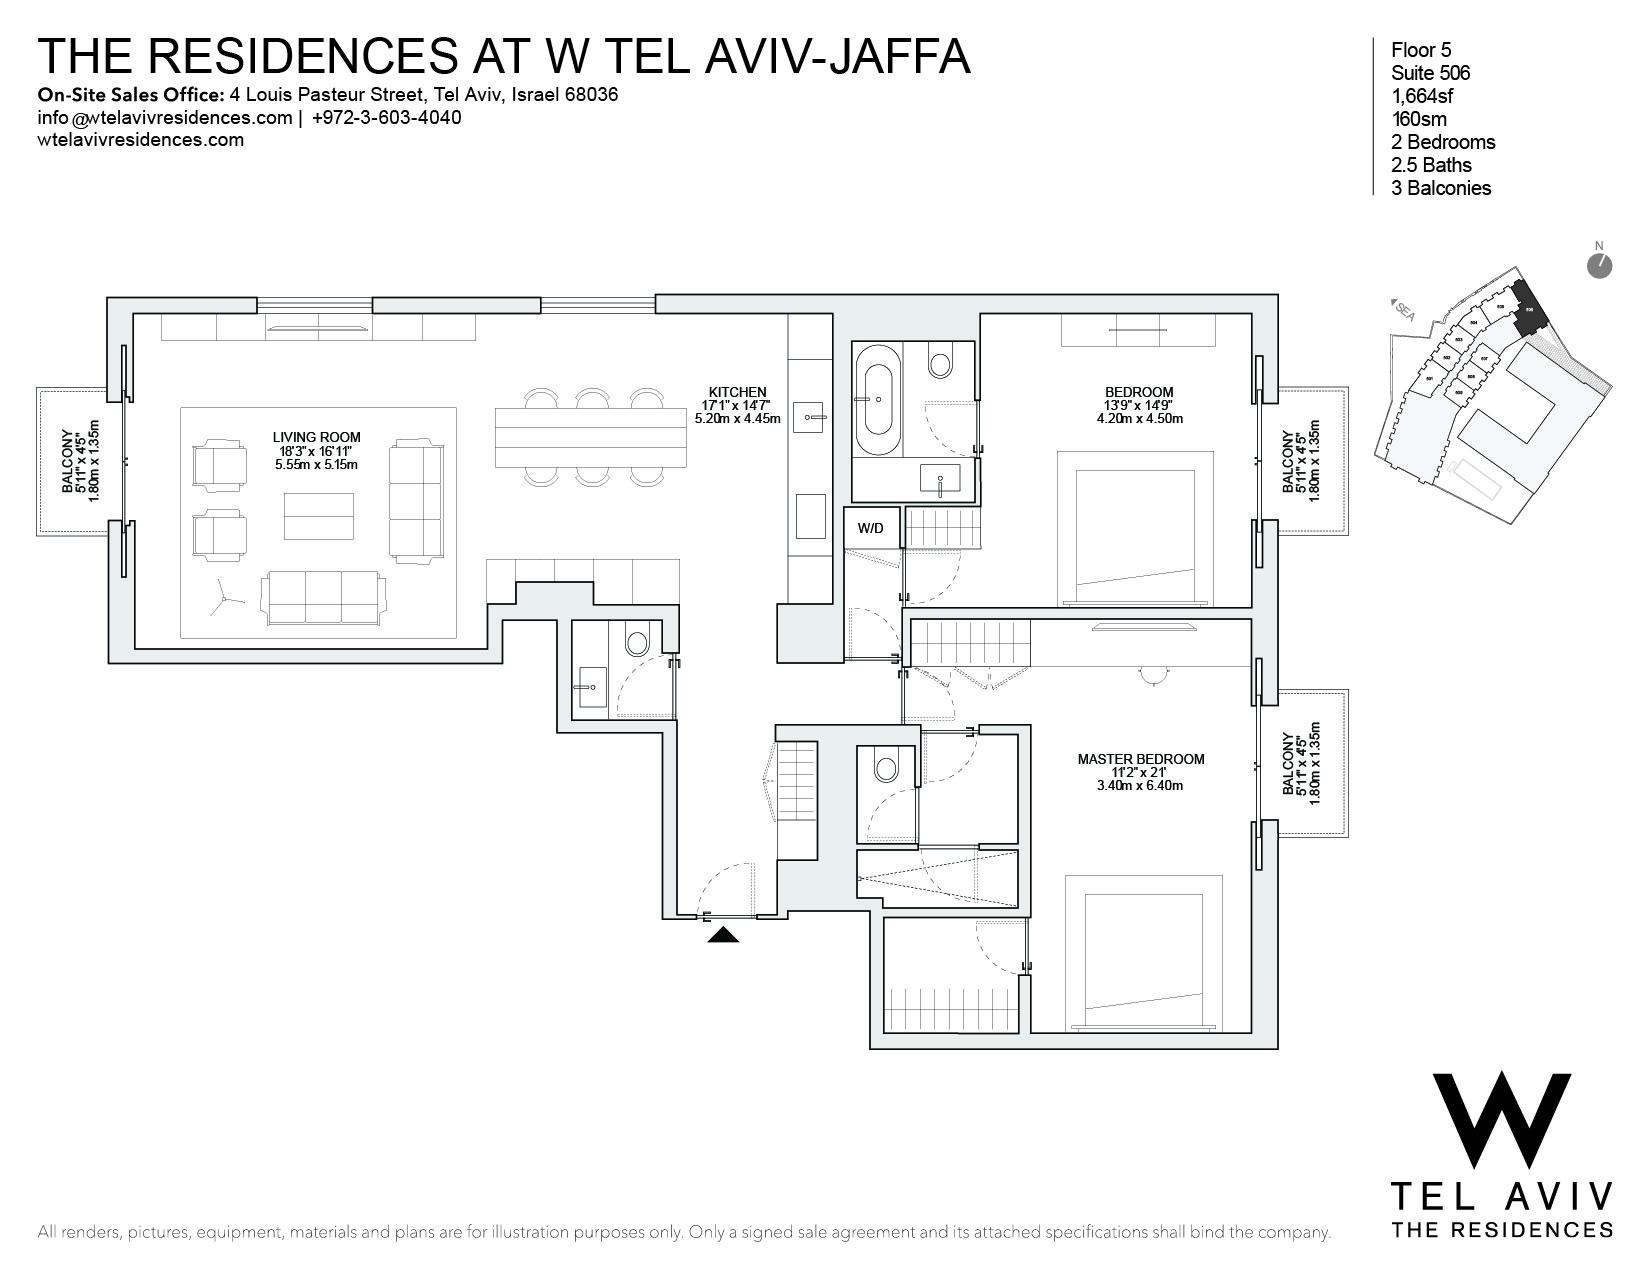 Apartment for Sale at W Tel Aviv Residences, 506 Luxury Apartment Tel Aviv, Israel 68036 Israel